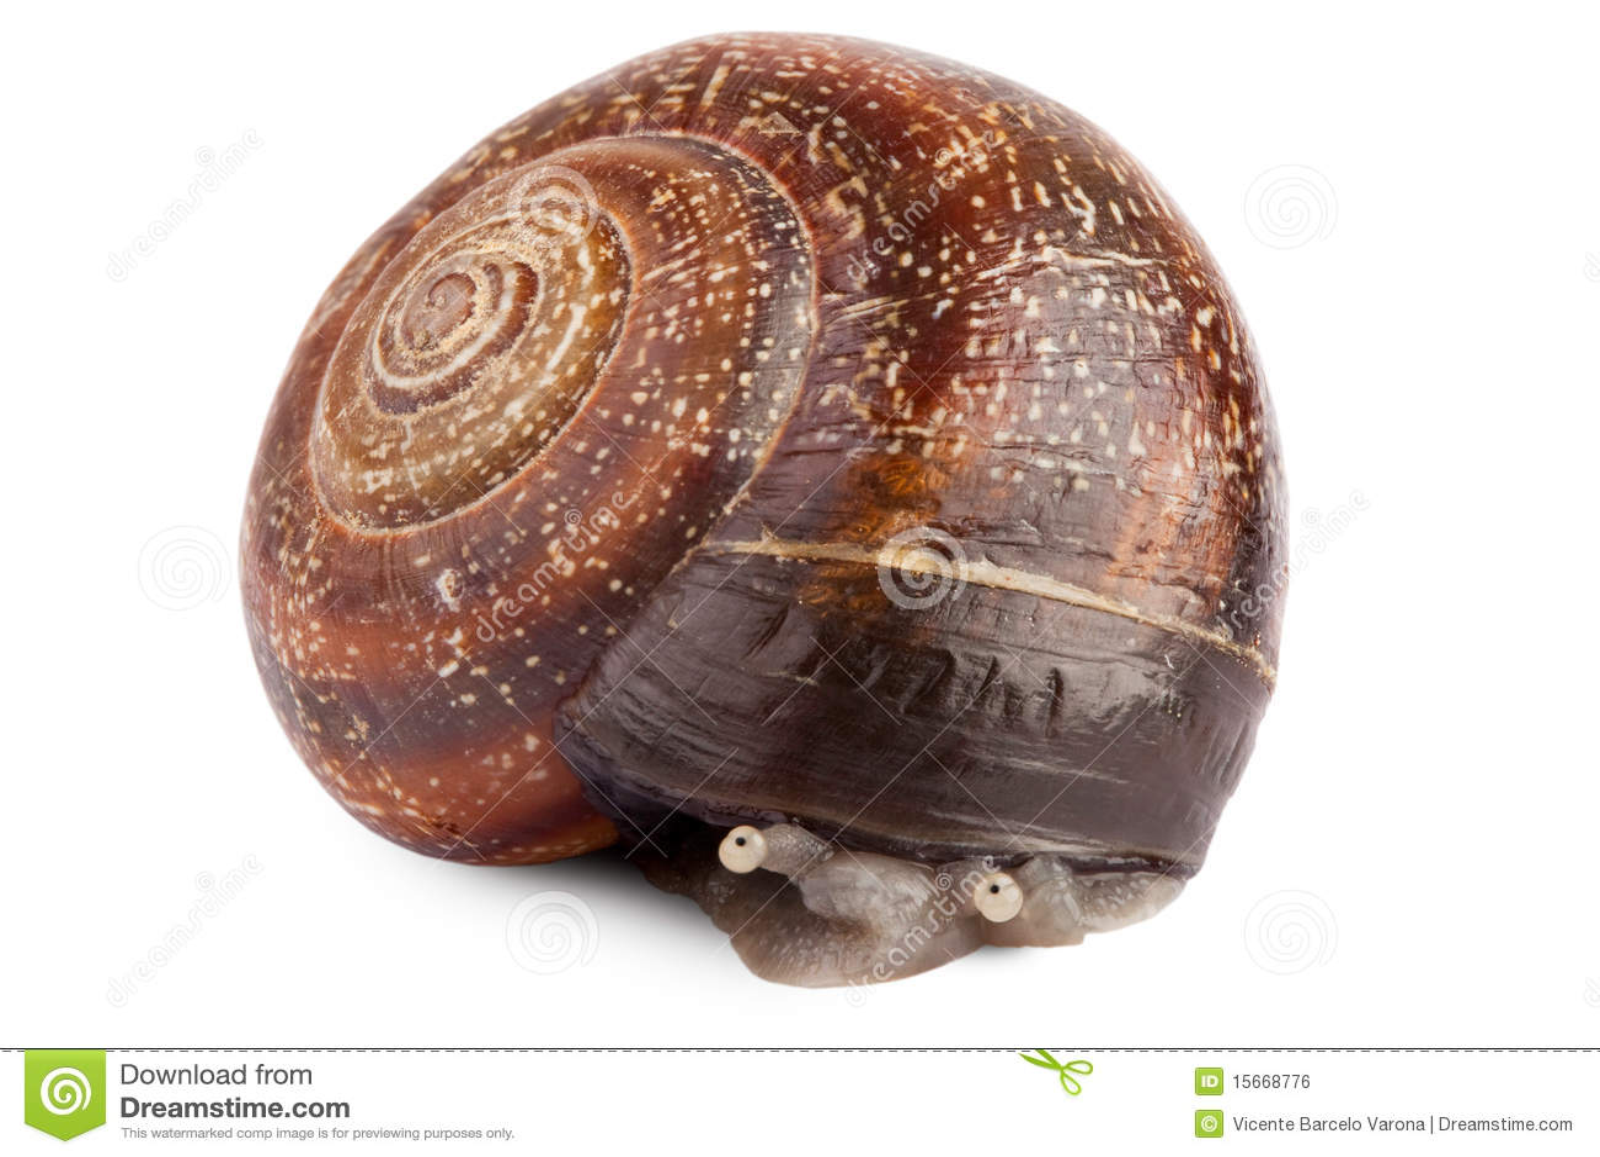 shy snail royalty free stock image image 15668776 blue crab clipart free blue crab clip art free